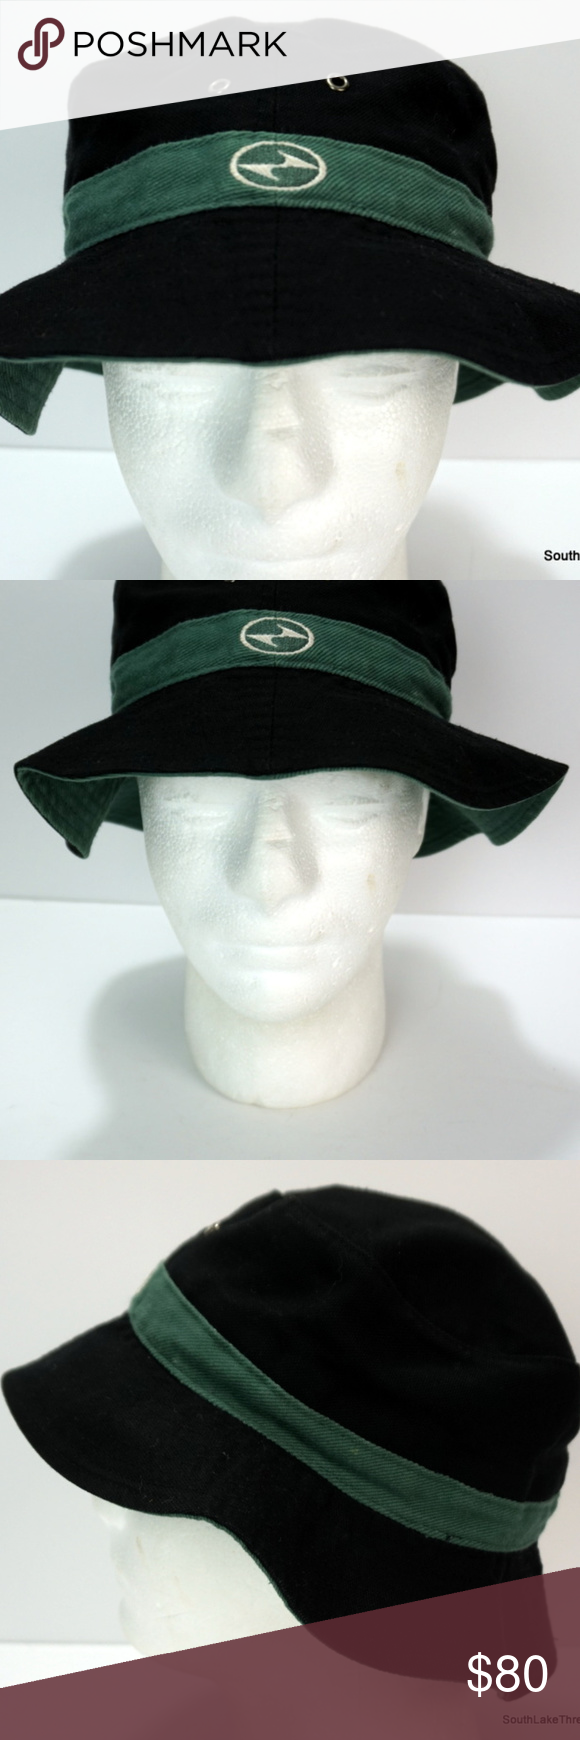 823f2bad63a86 Vintage 90s Nike Tiger Woods TW Bucket Hat Vintage 90s Nike Tiger Woods TW Nike  Golf